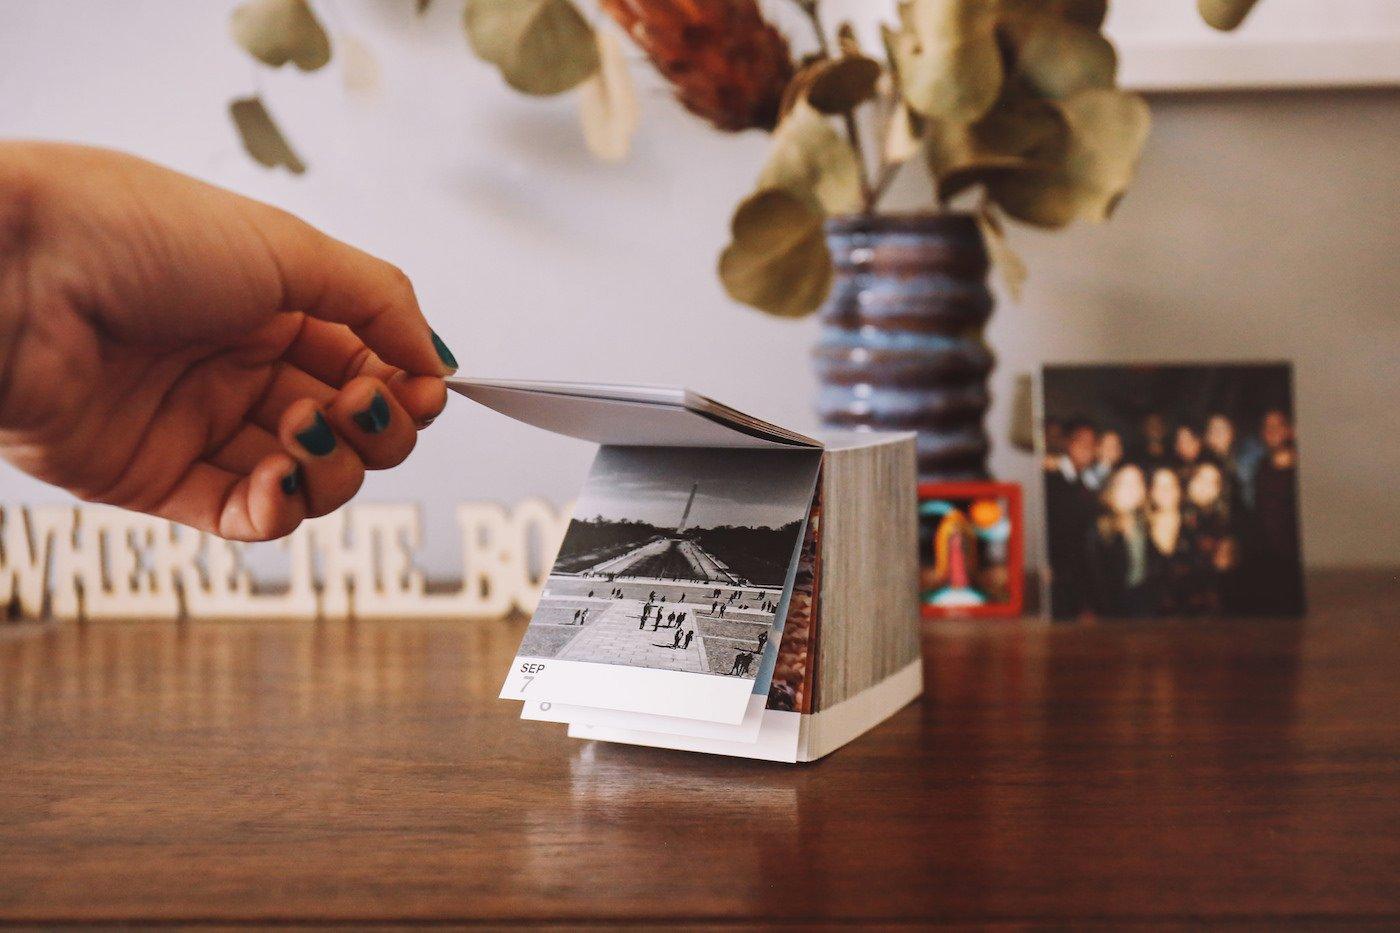 Calendar | Make Custom Tearaway Photo Calendars | Social Create A Tear Sheet Calendar